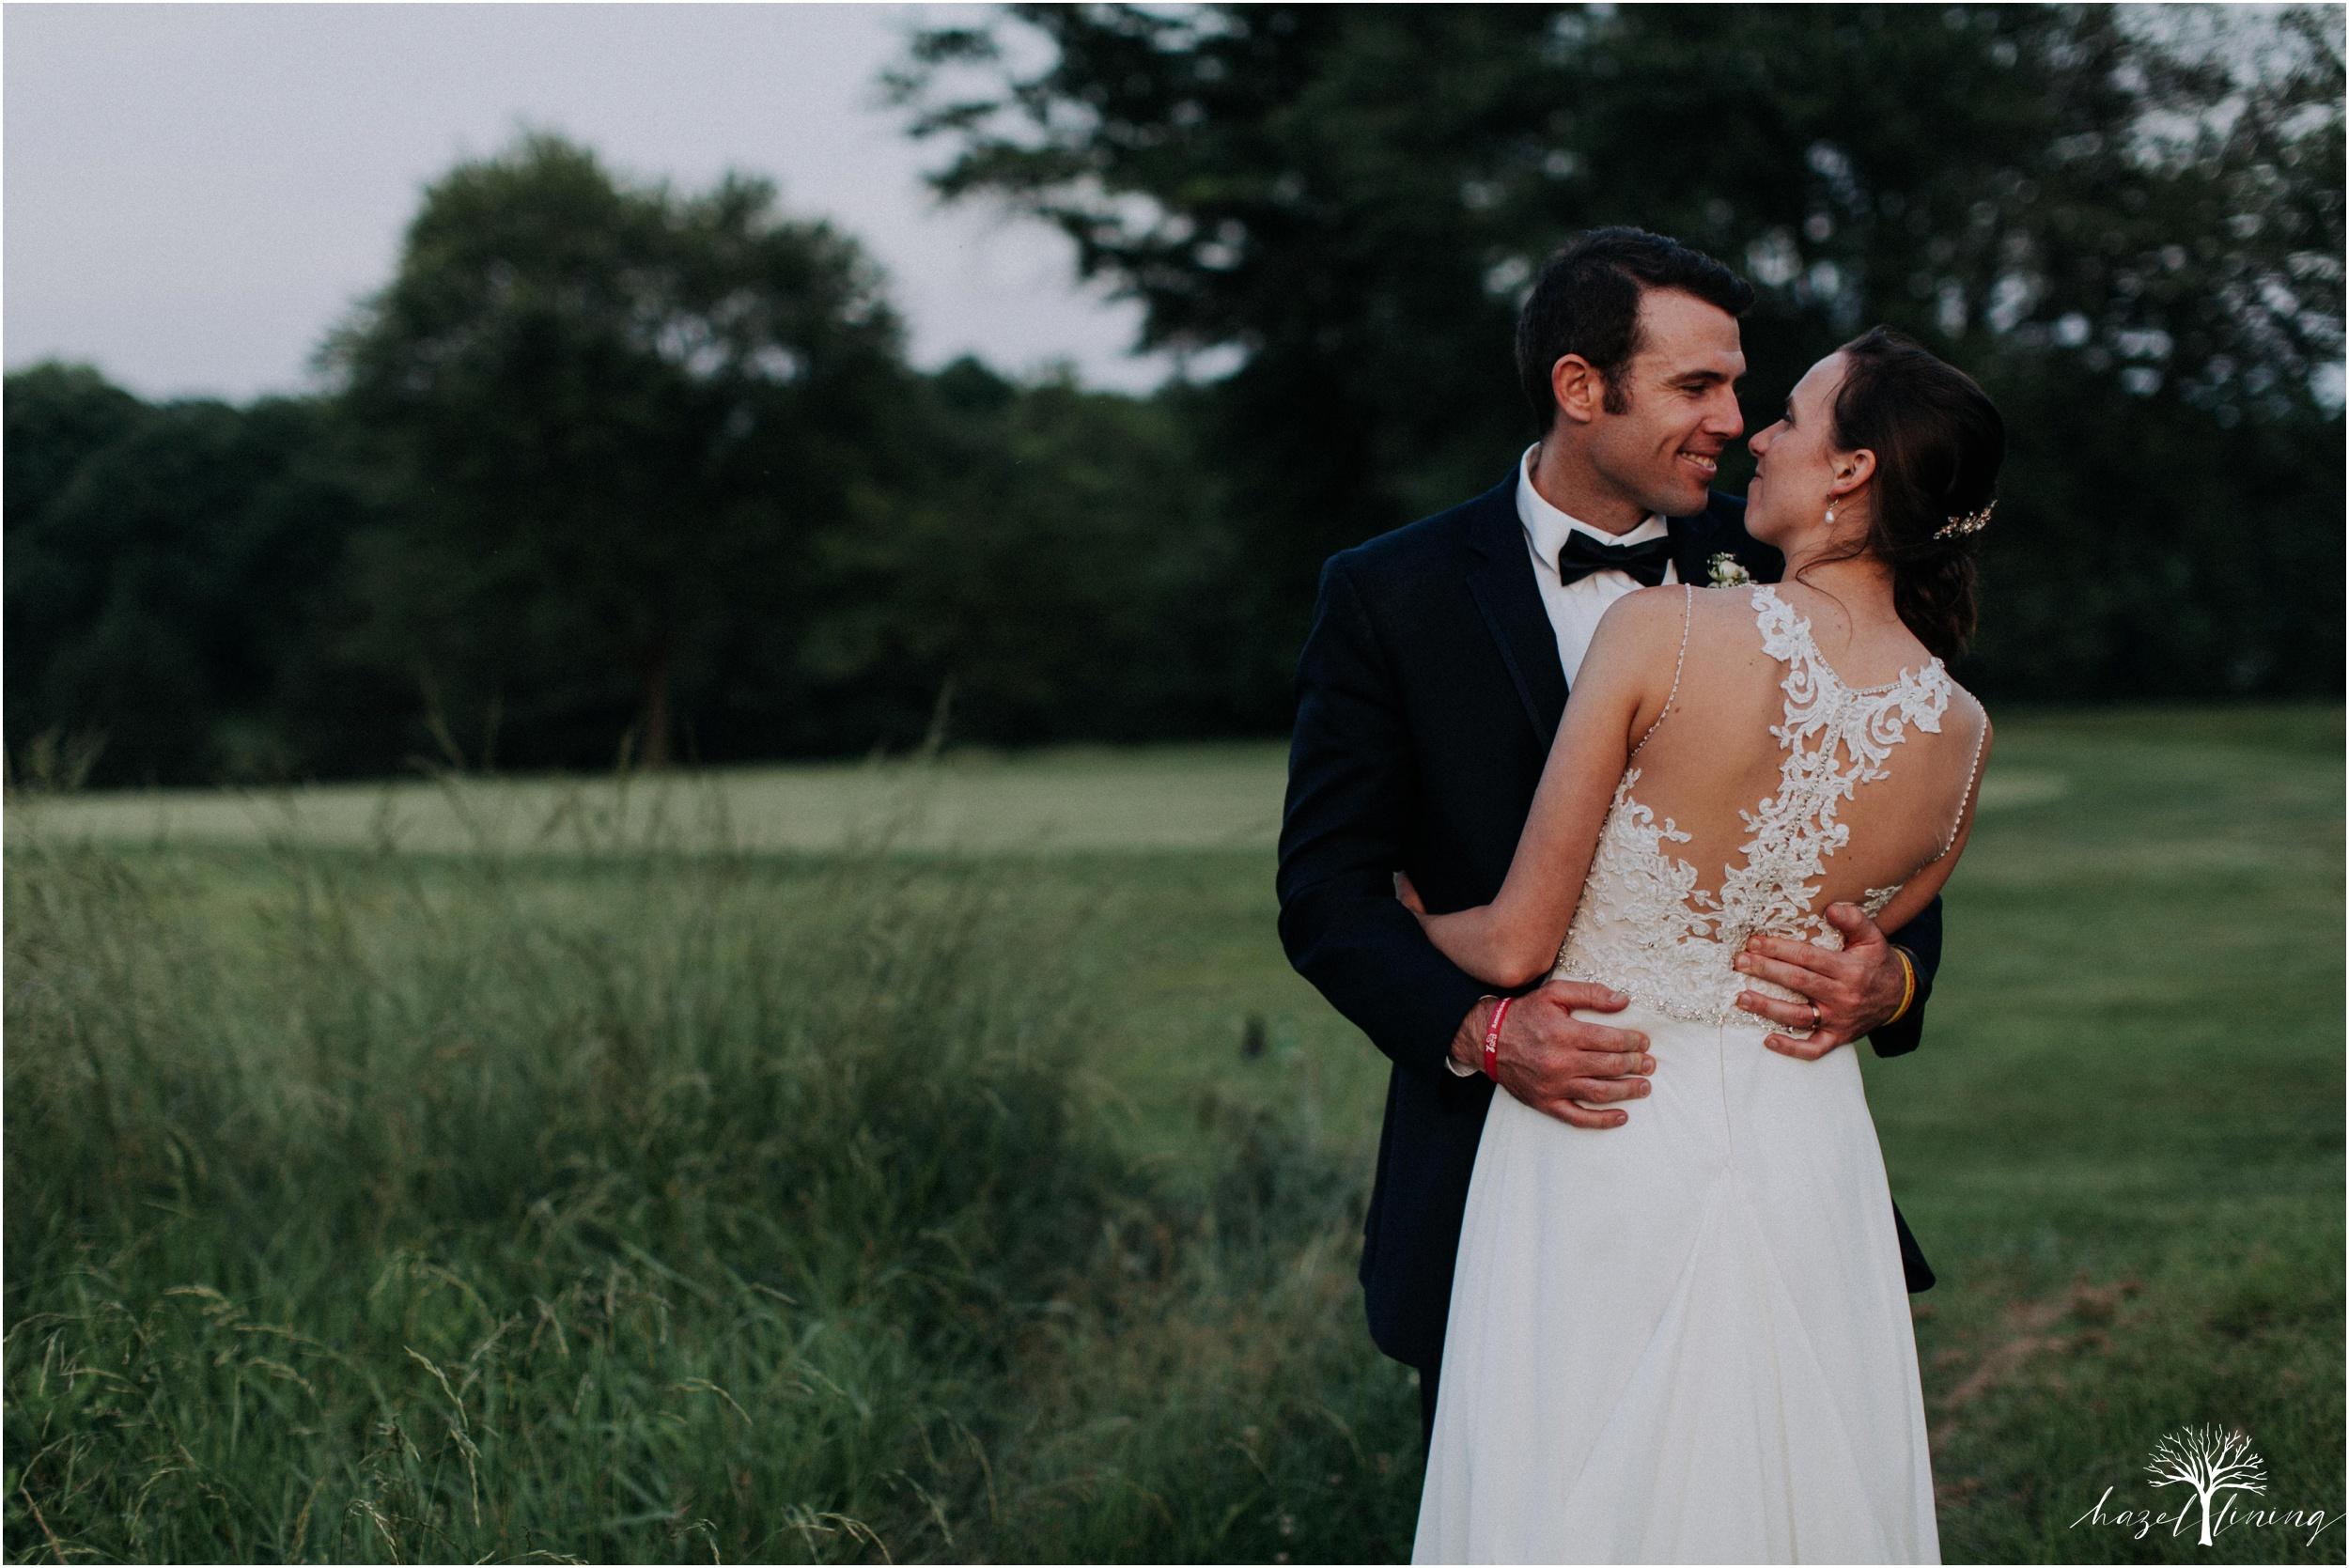 hazel-lining-travel-wedding-elopement-photography_0168.jpg